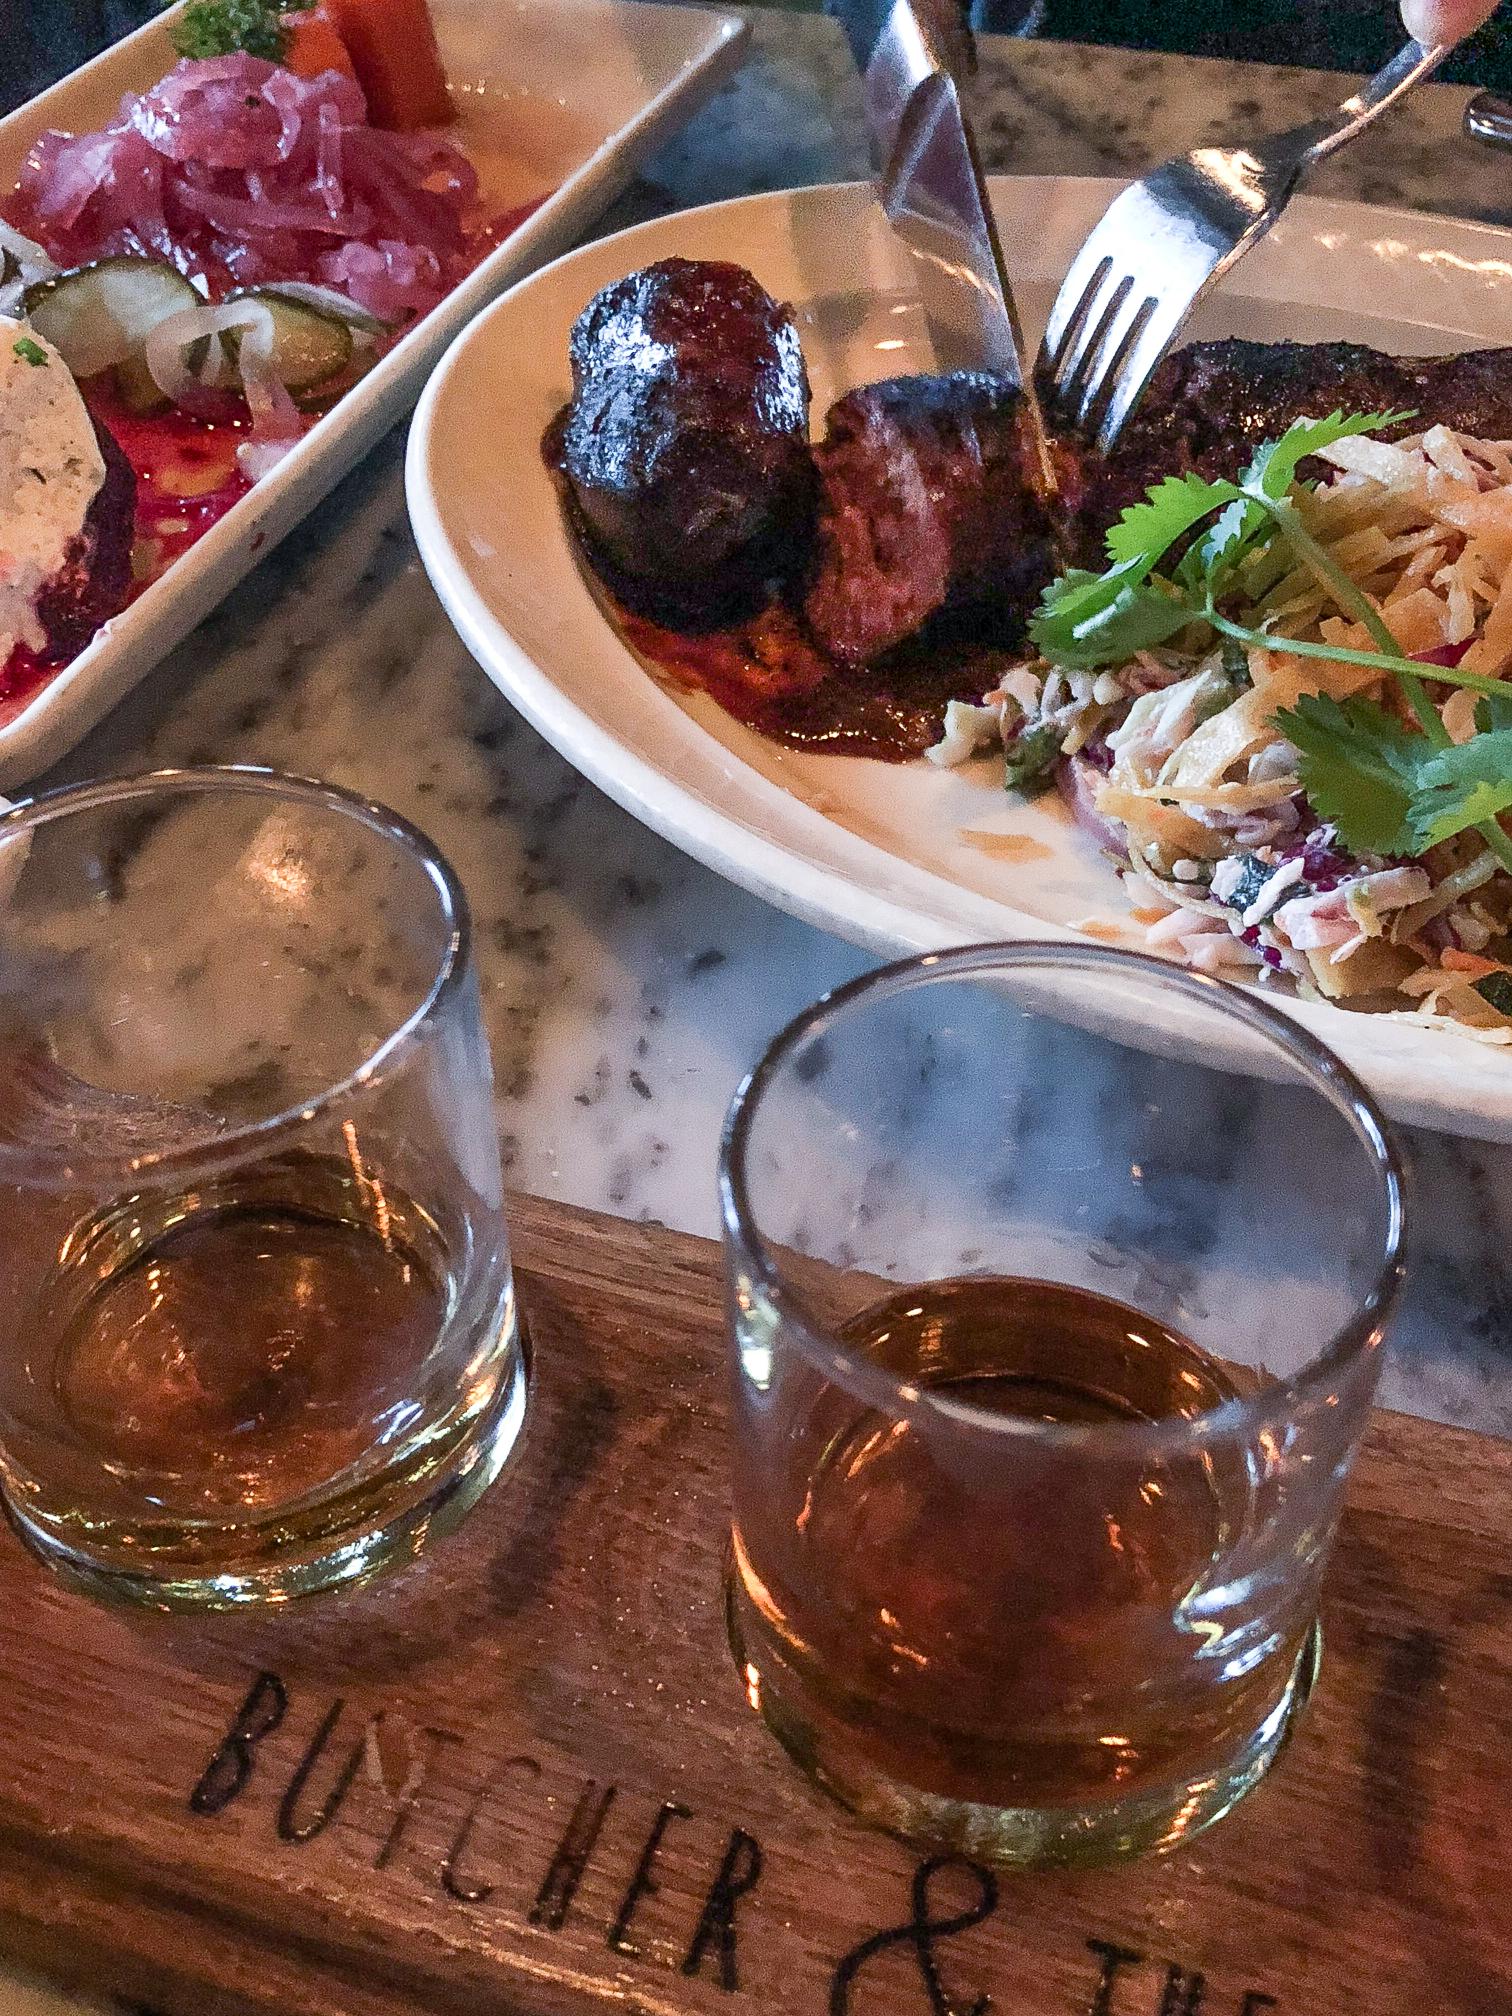 Bourbon flight and Texas Beef Link